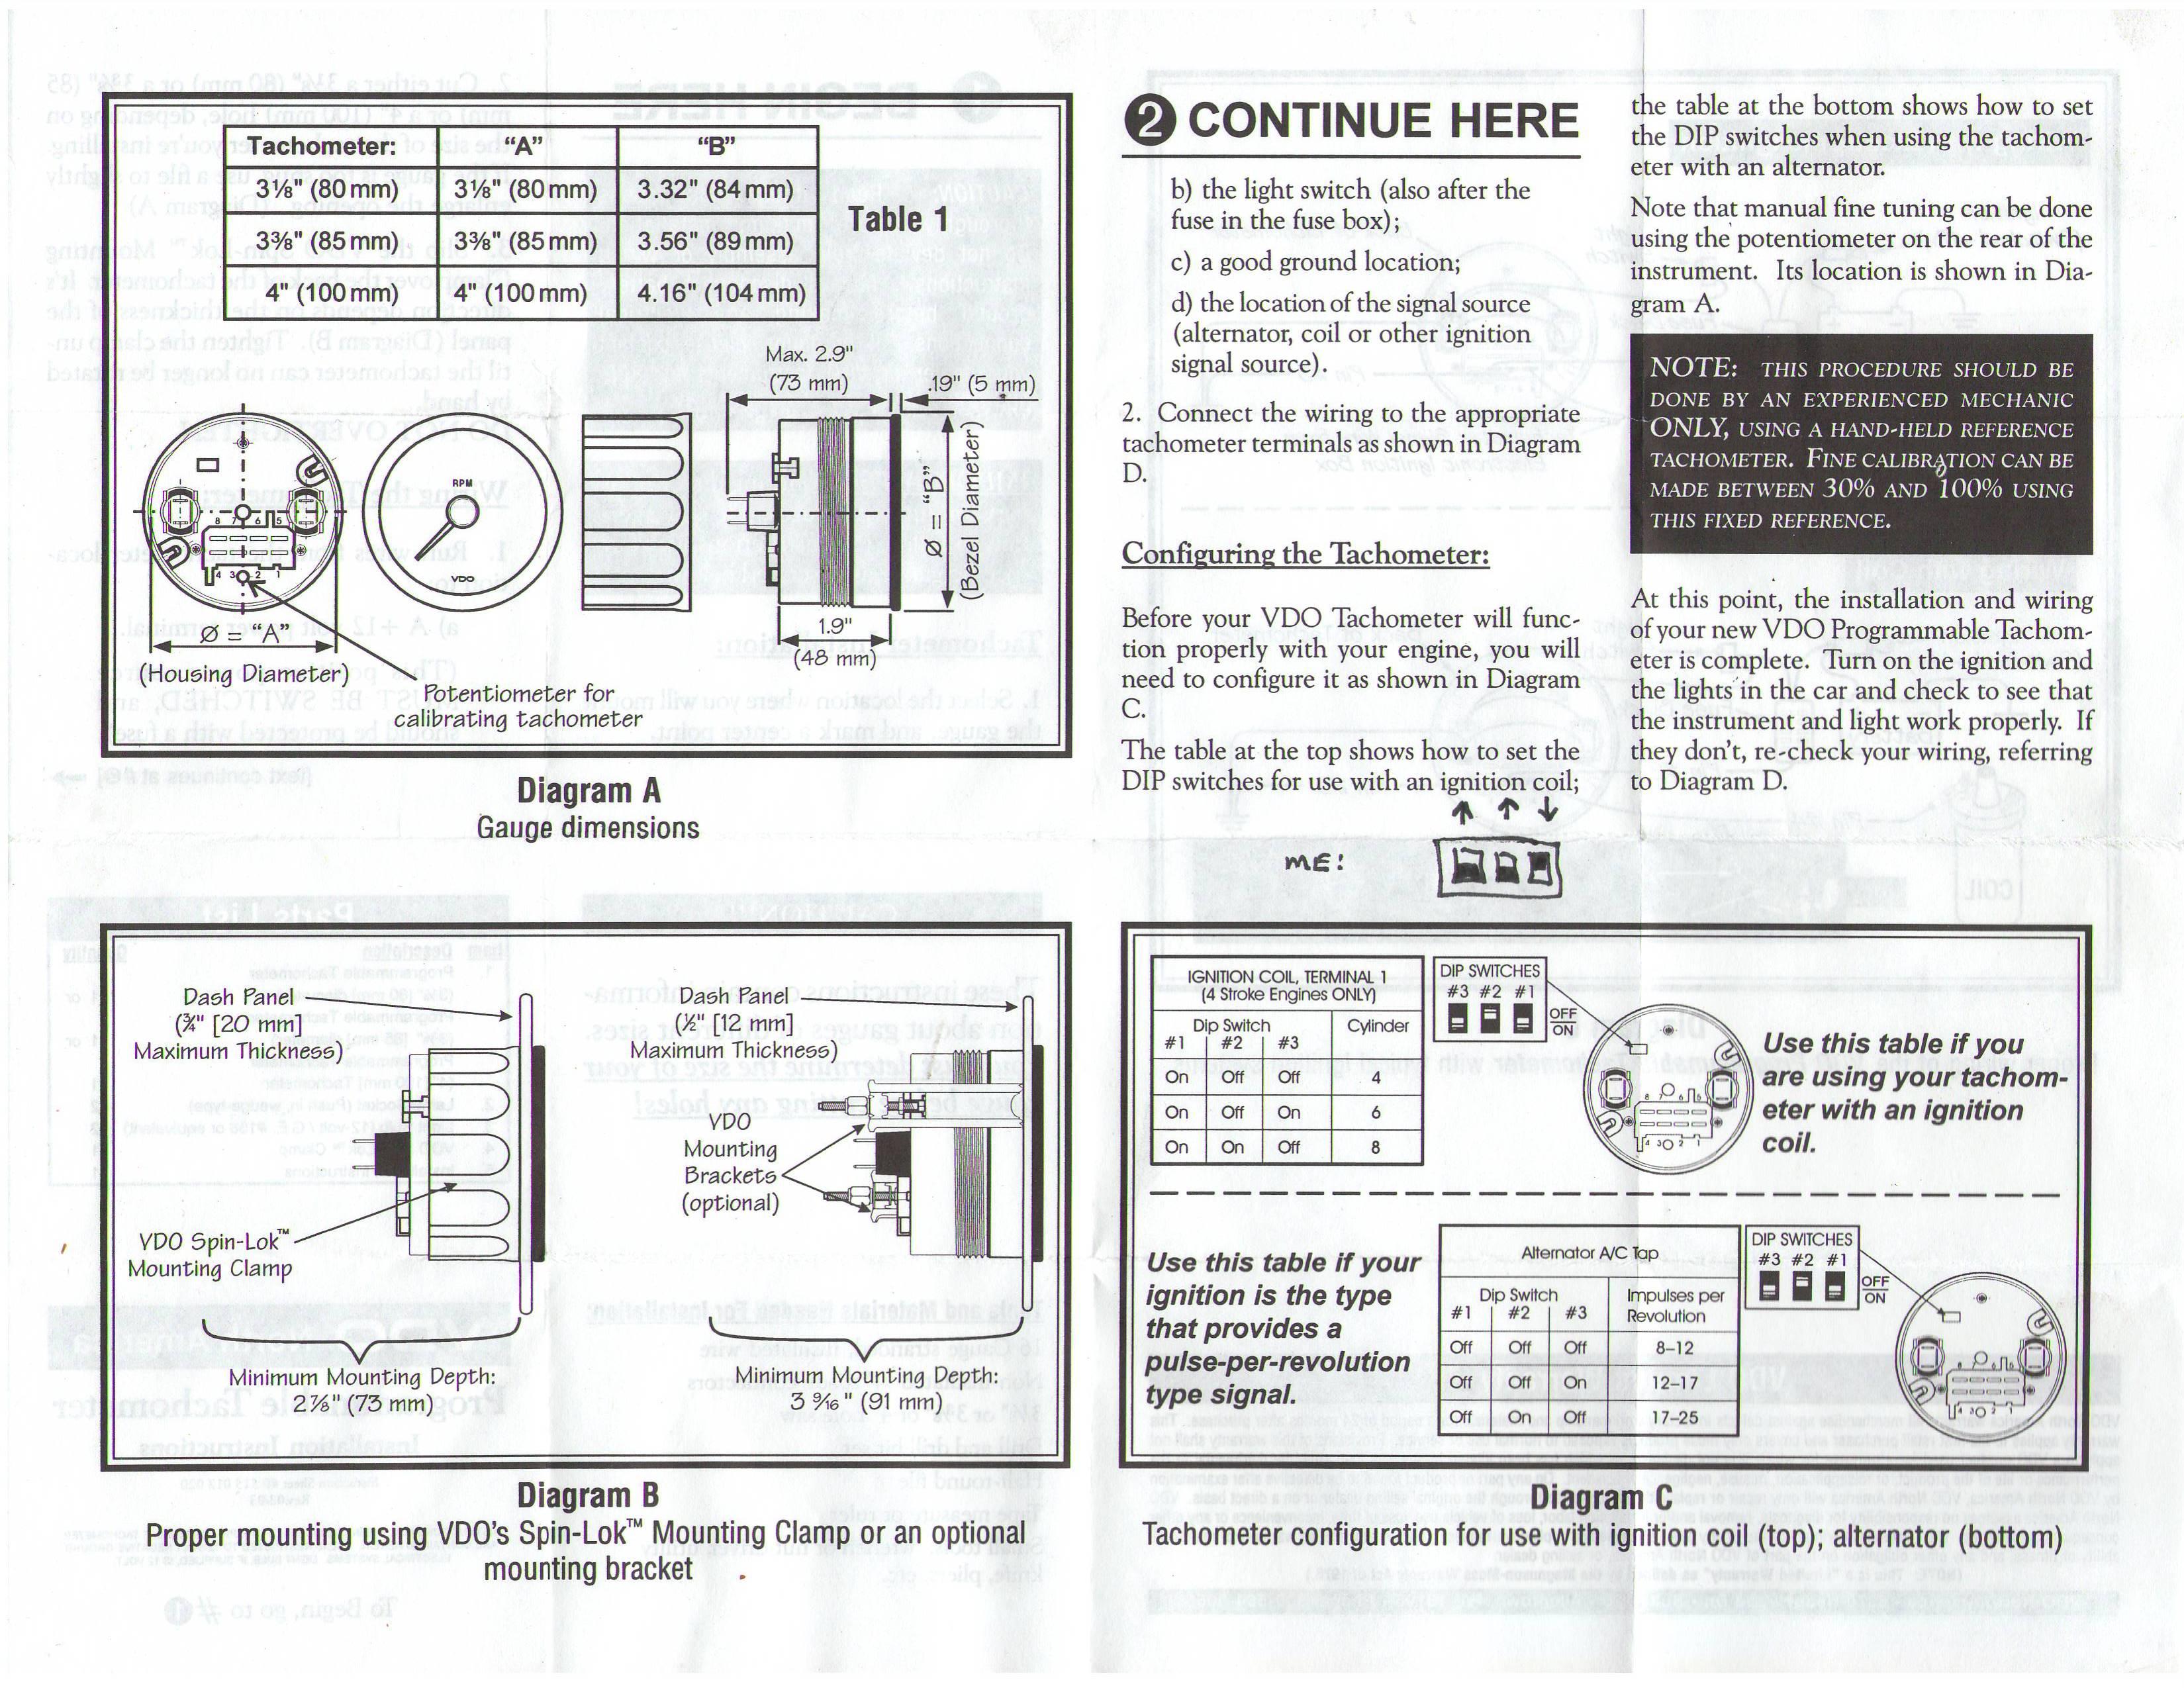 Vdo Tachometer Wiring Color Vdo Printable & Free Download Images